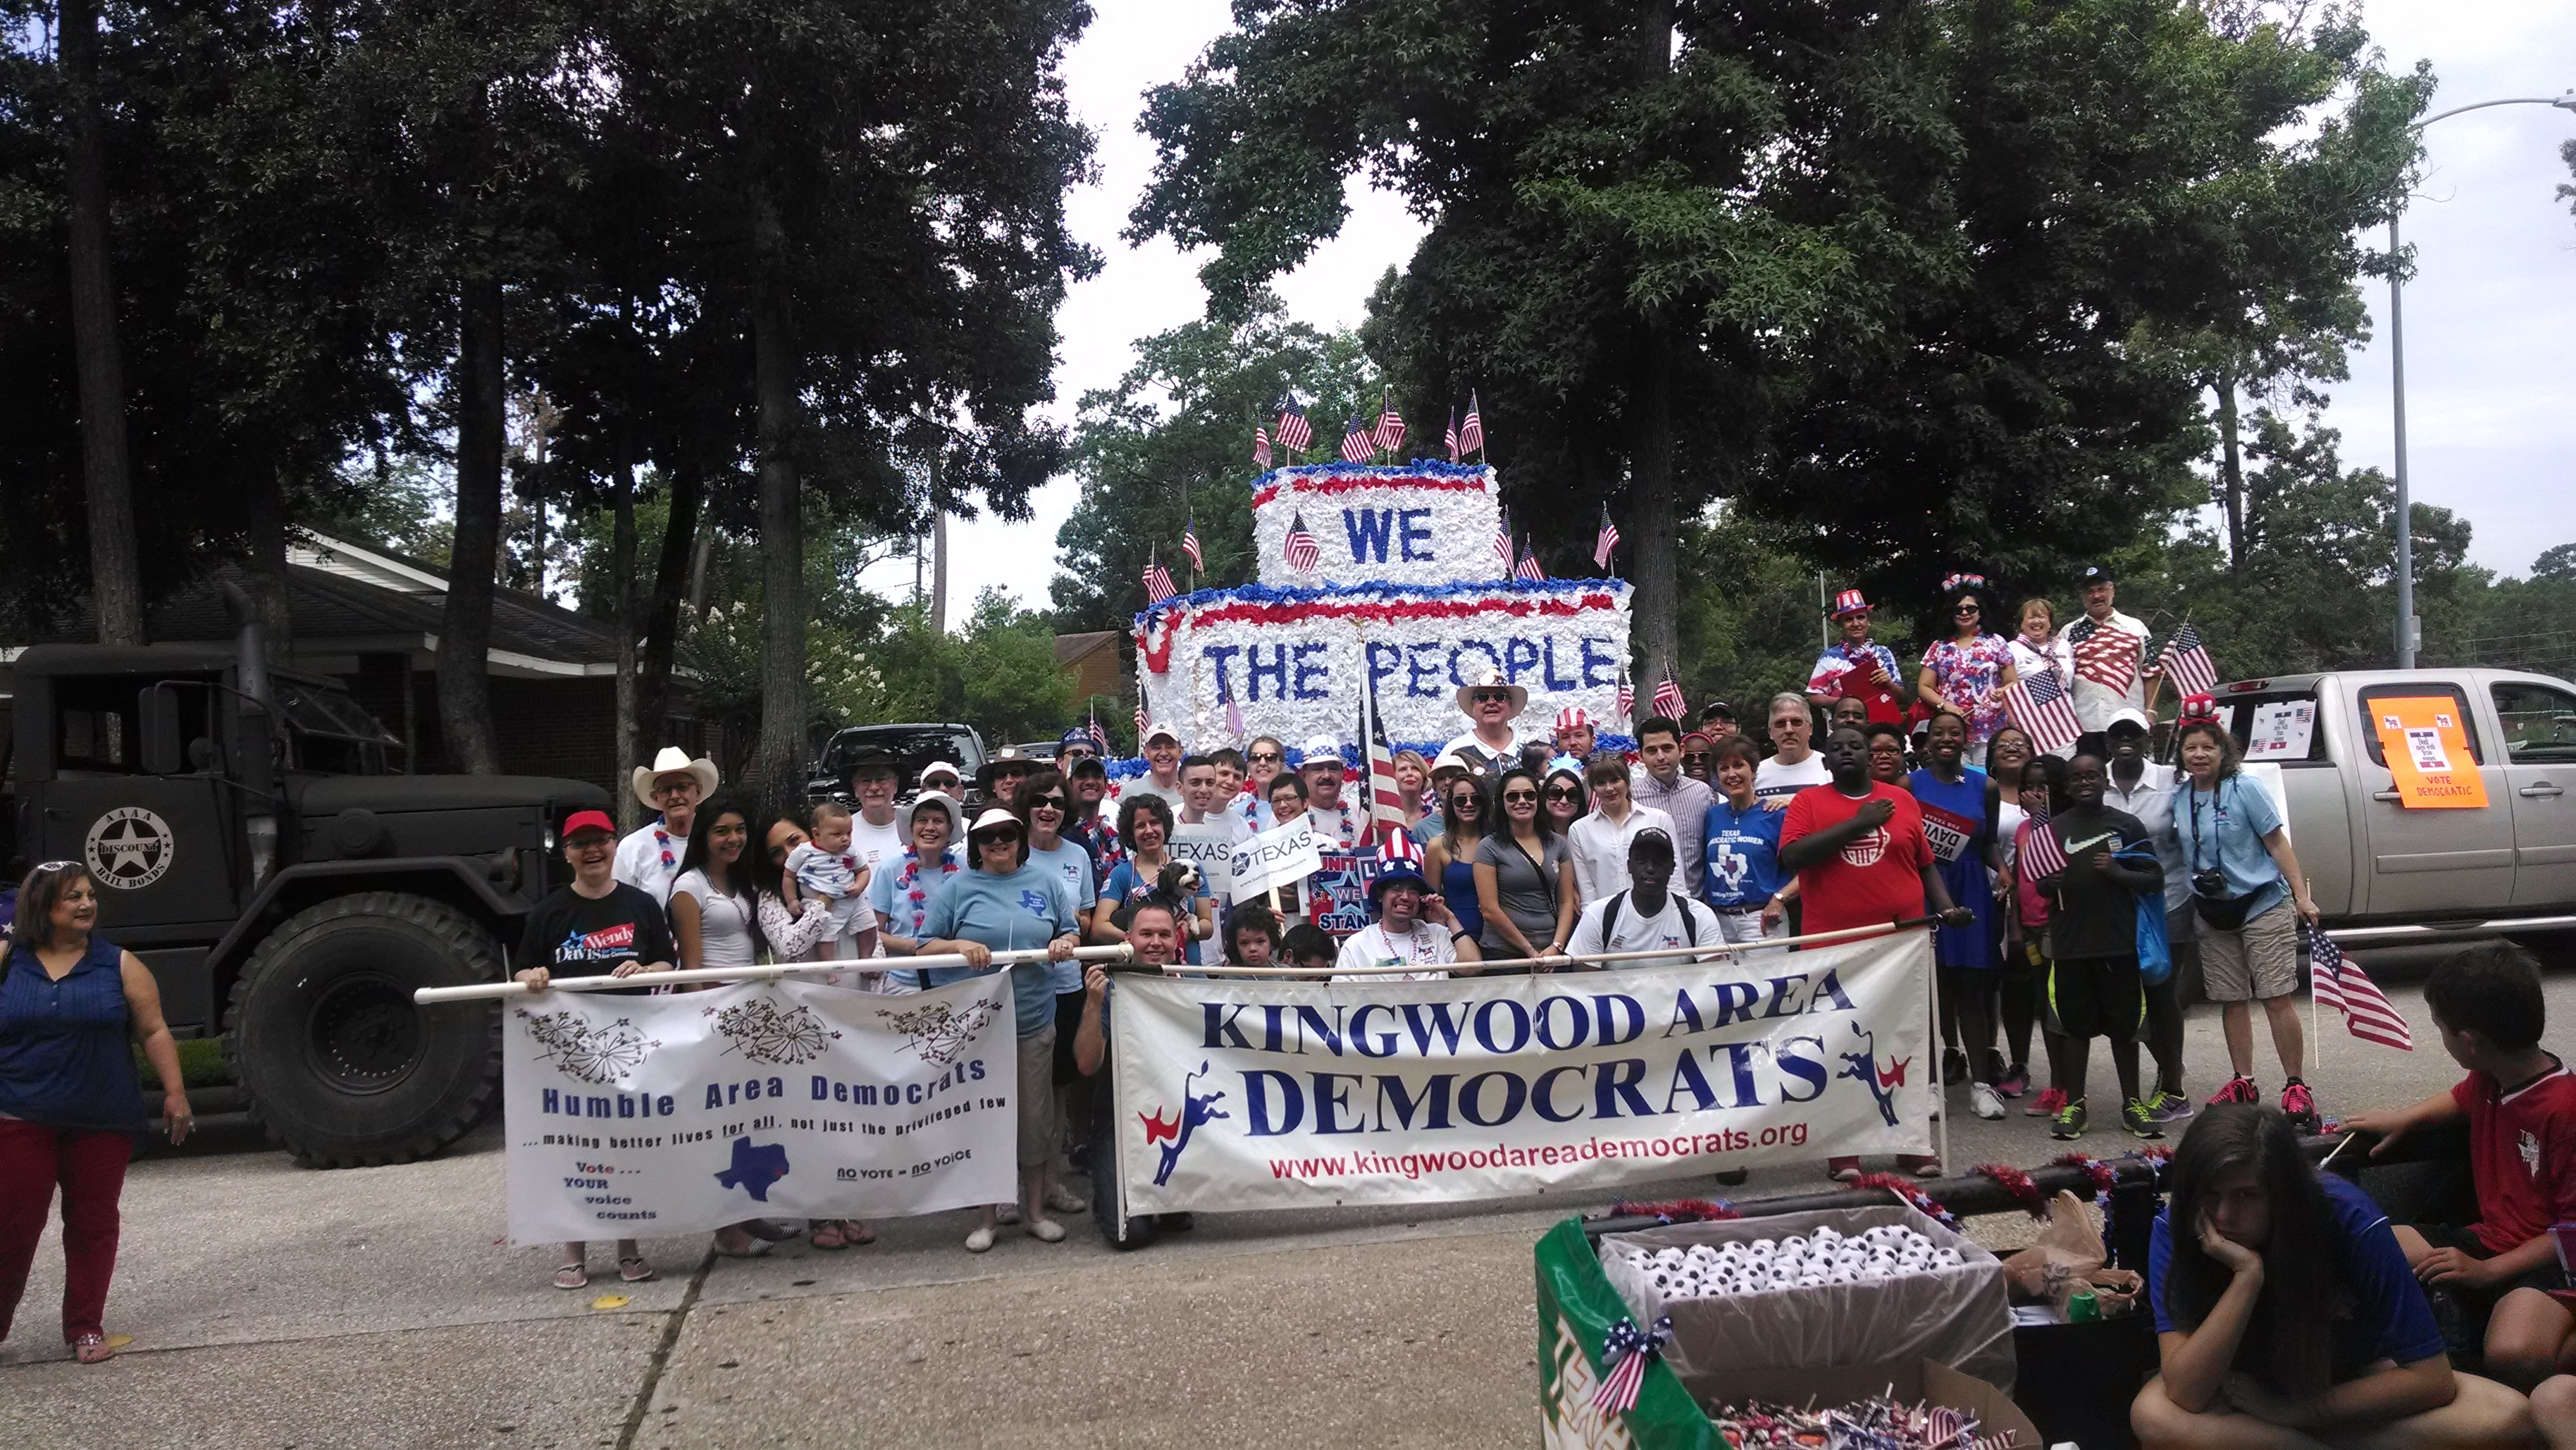 Kingwood Area Democrats 4th of July Parade